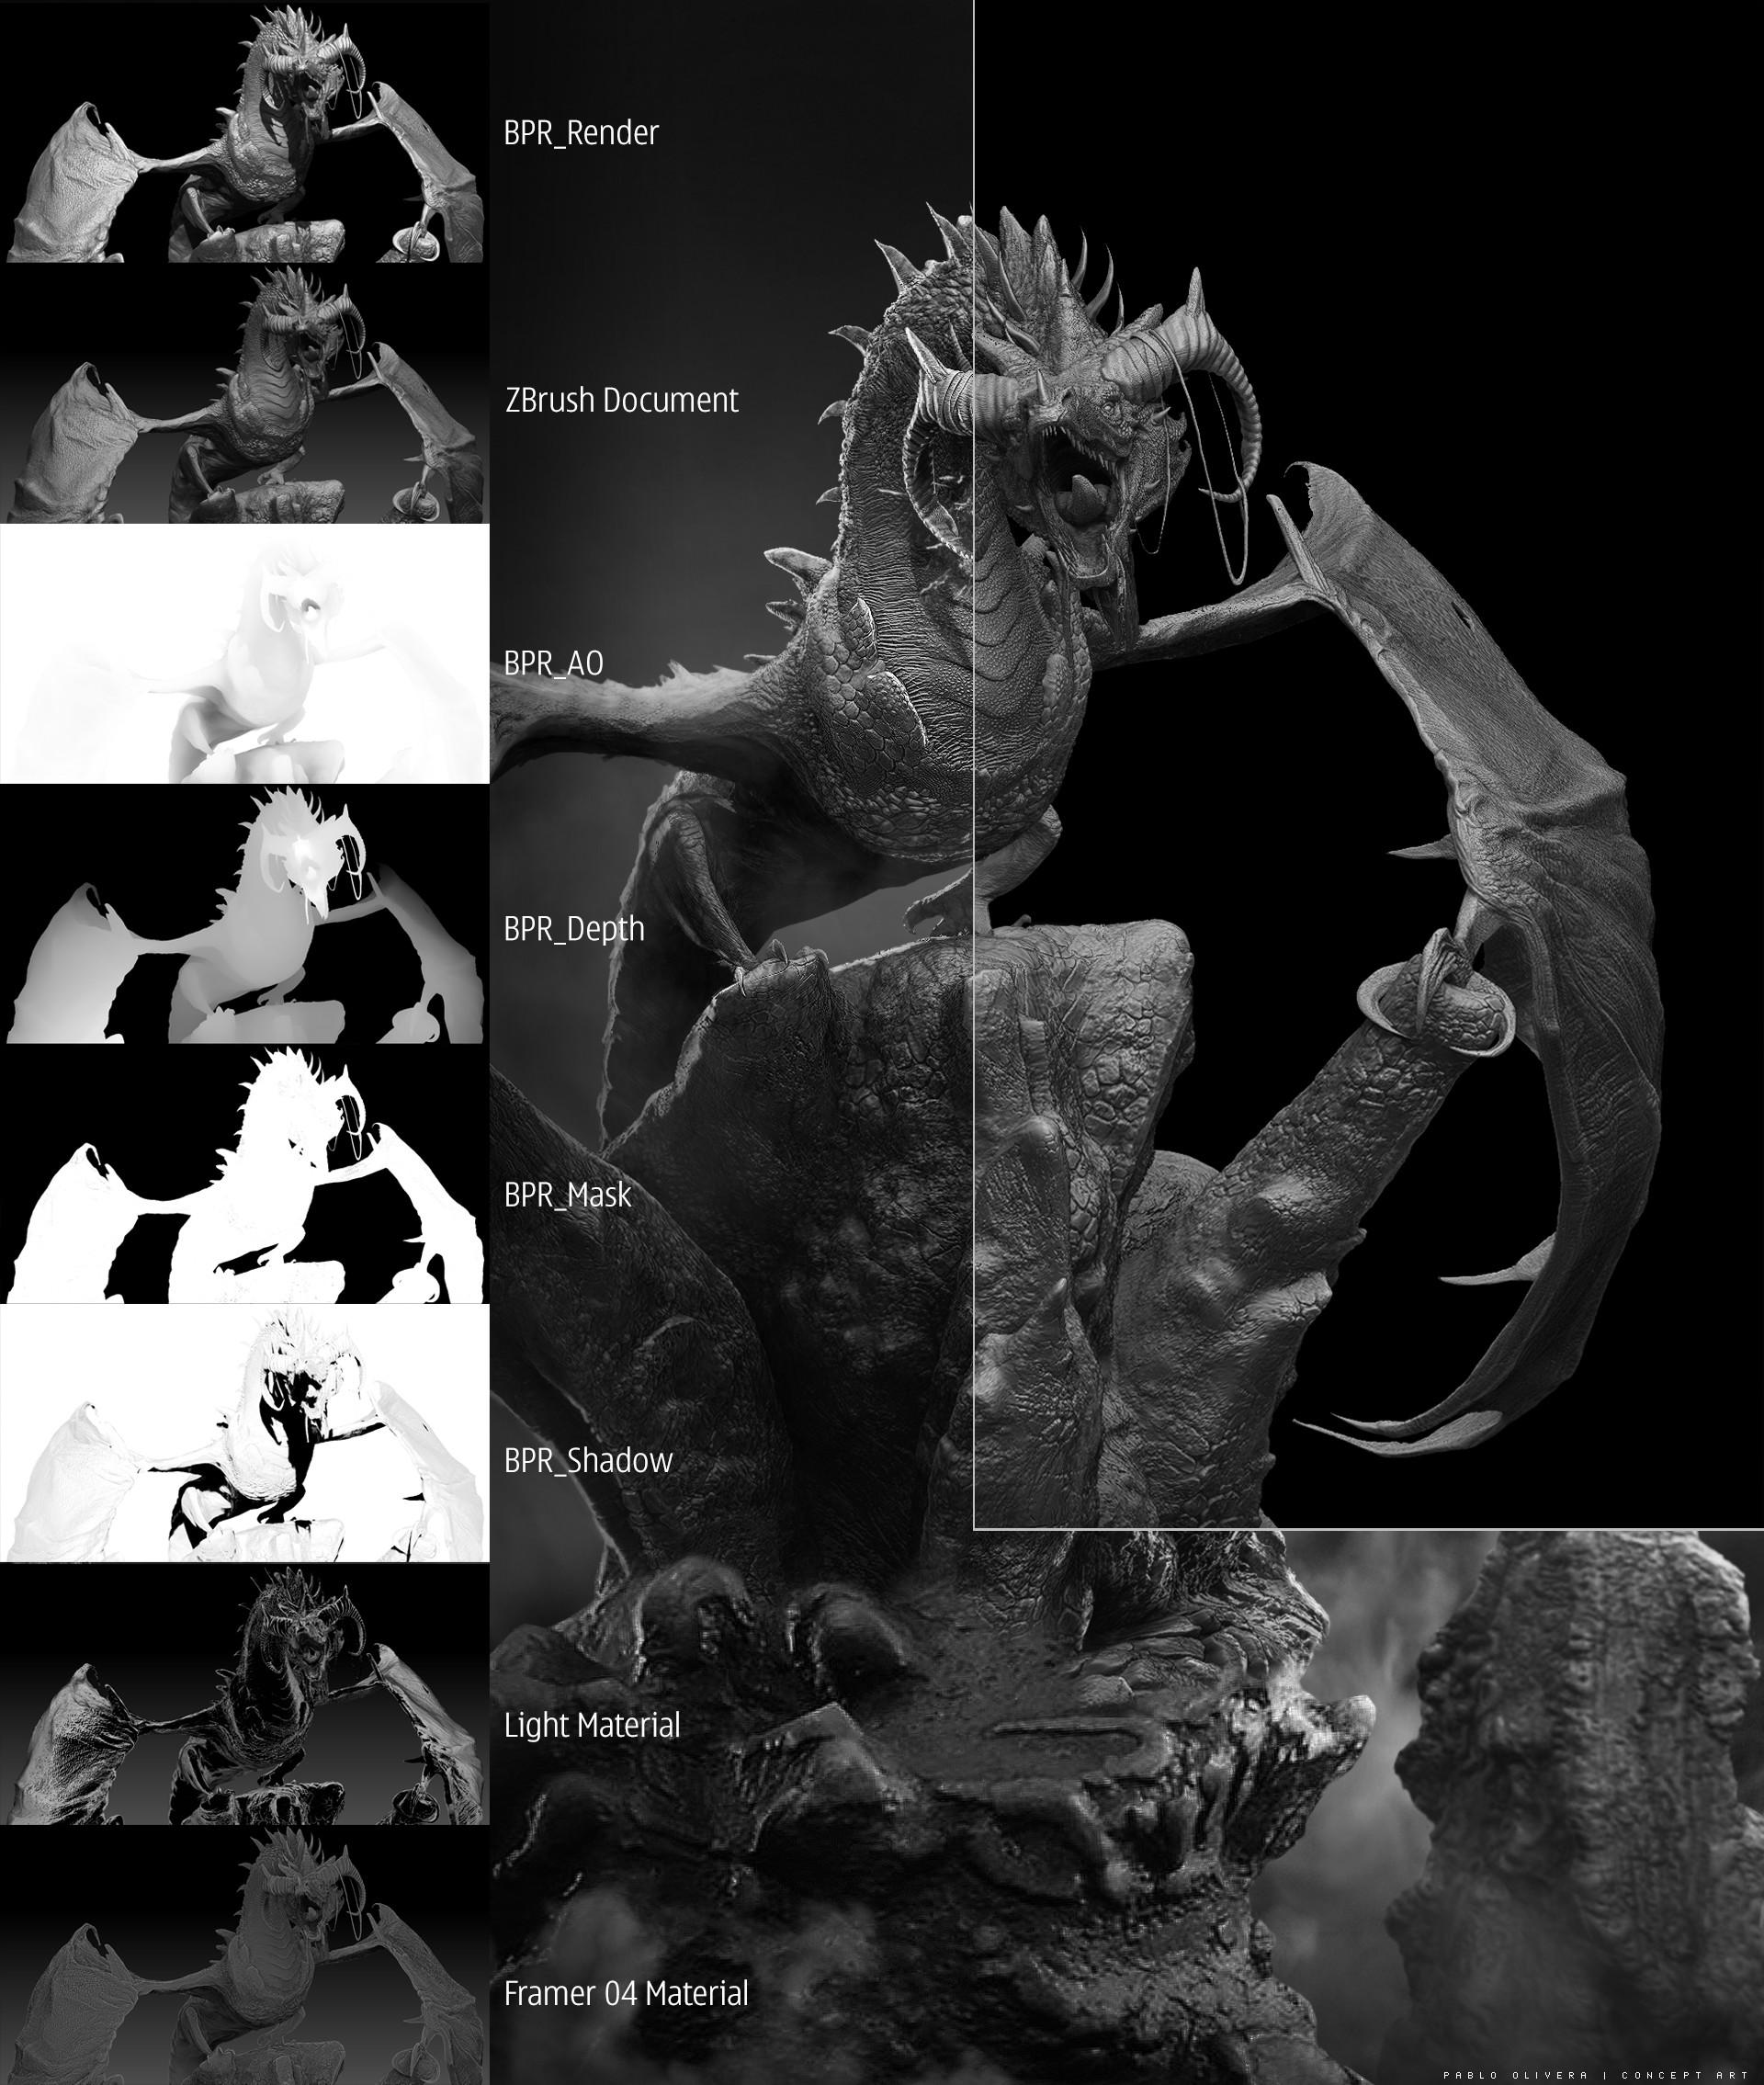 Pablo olivera dragones wacom zbrush 10 renders tes